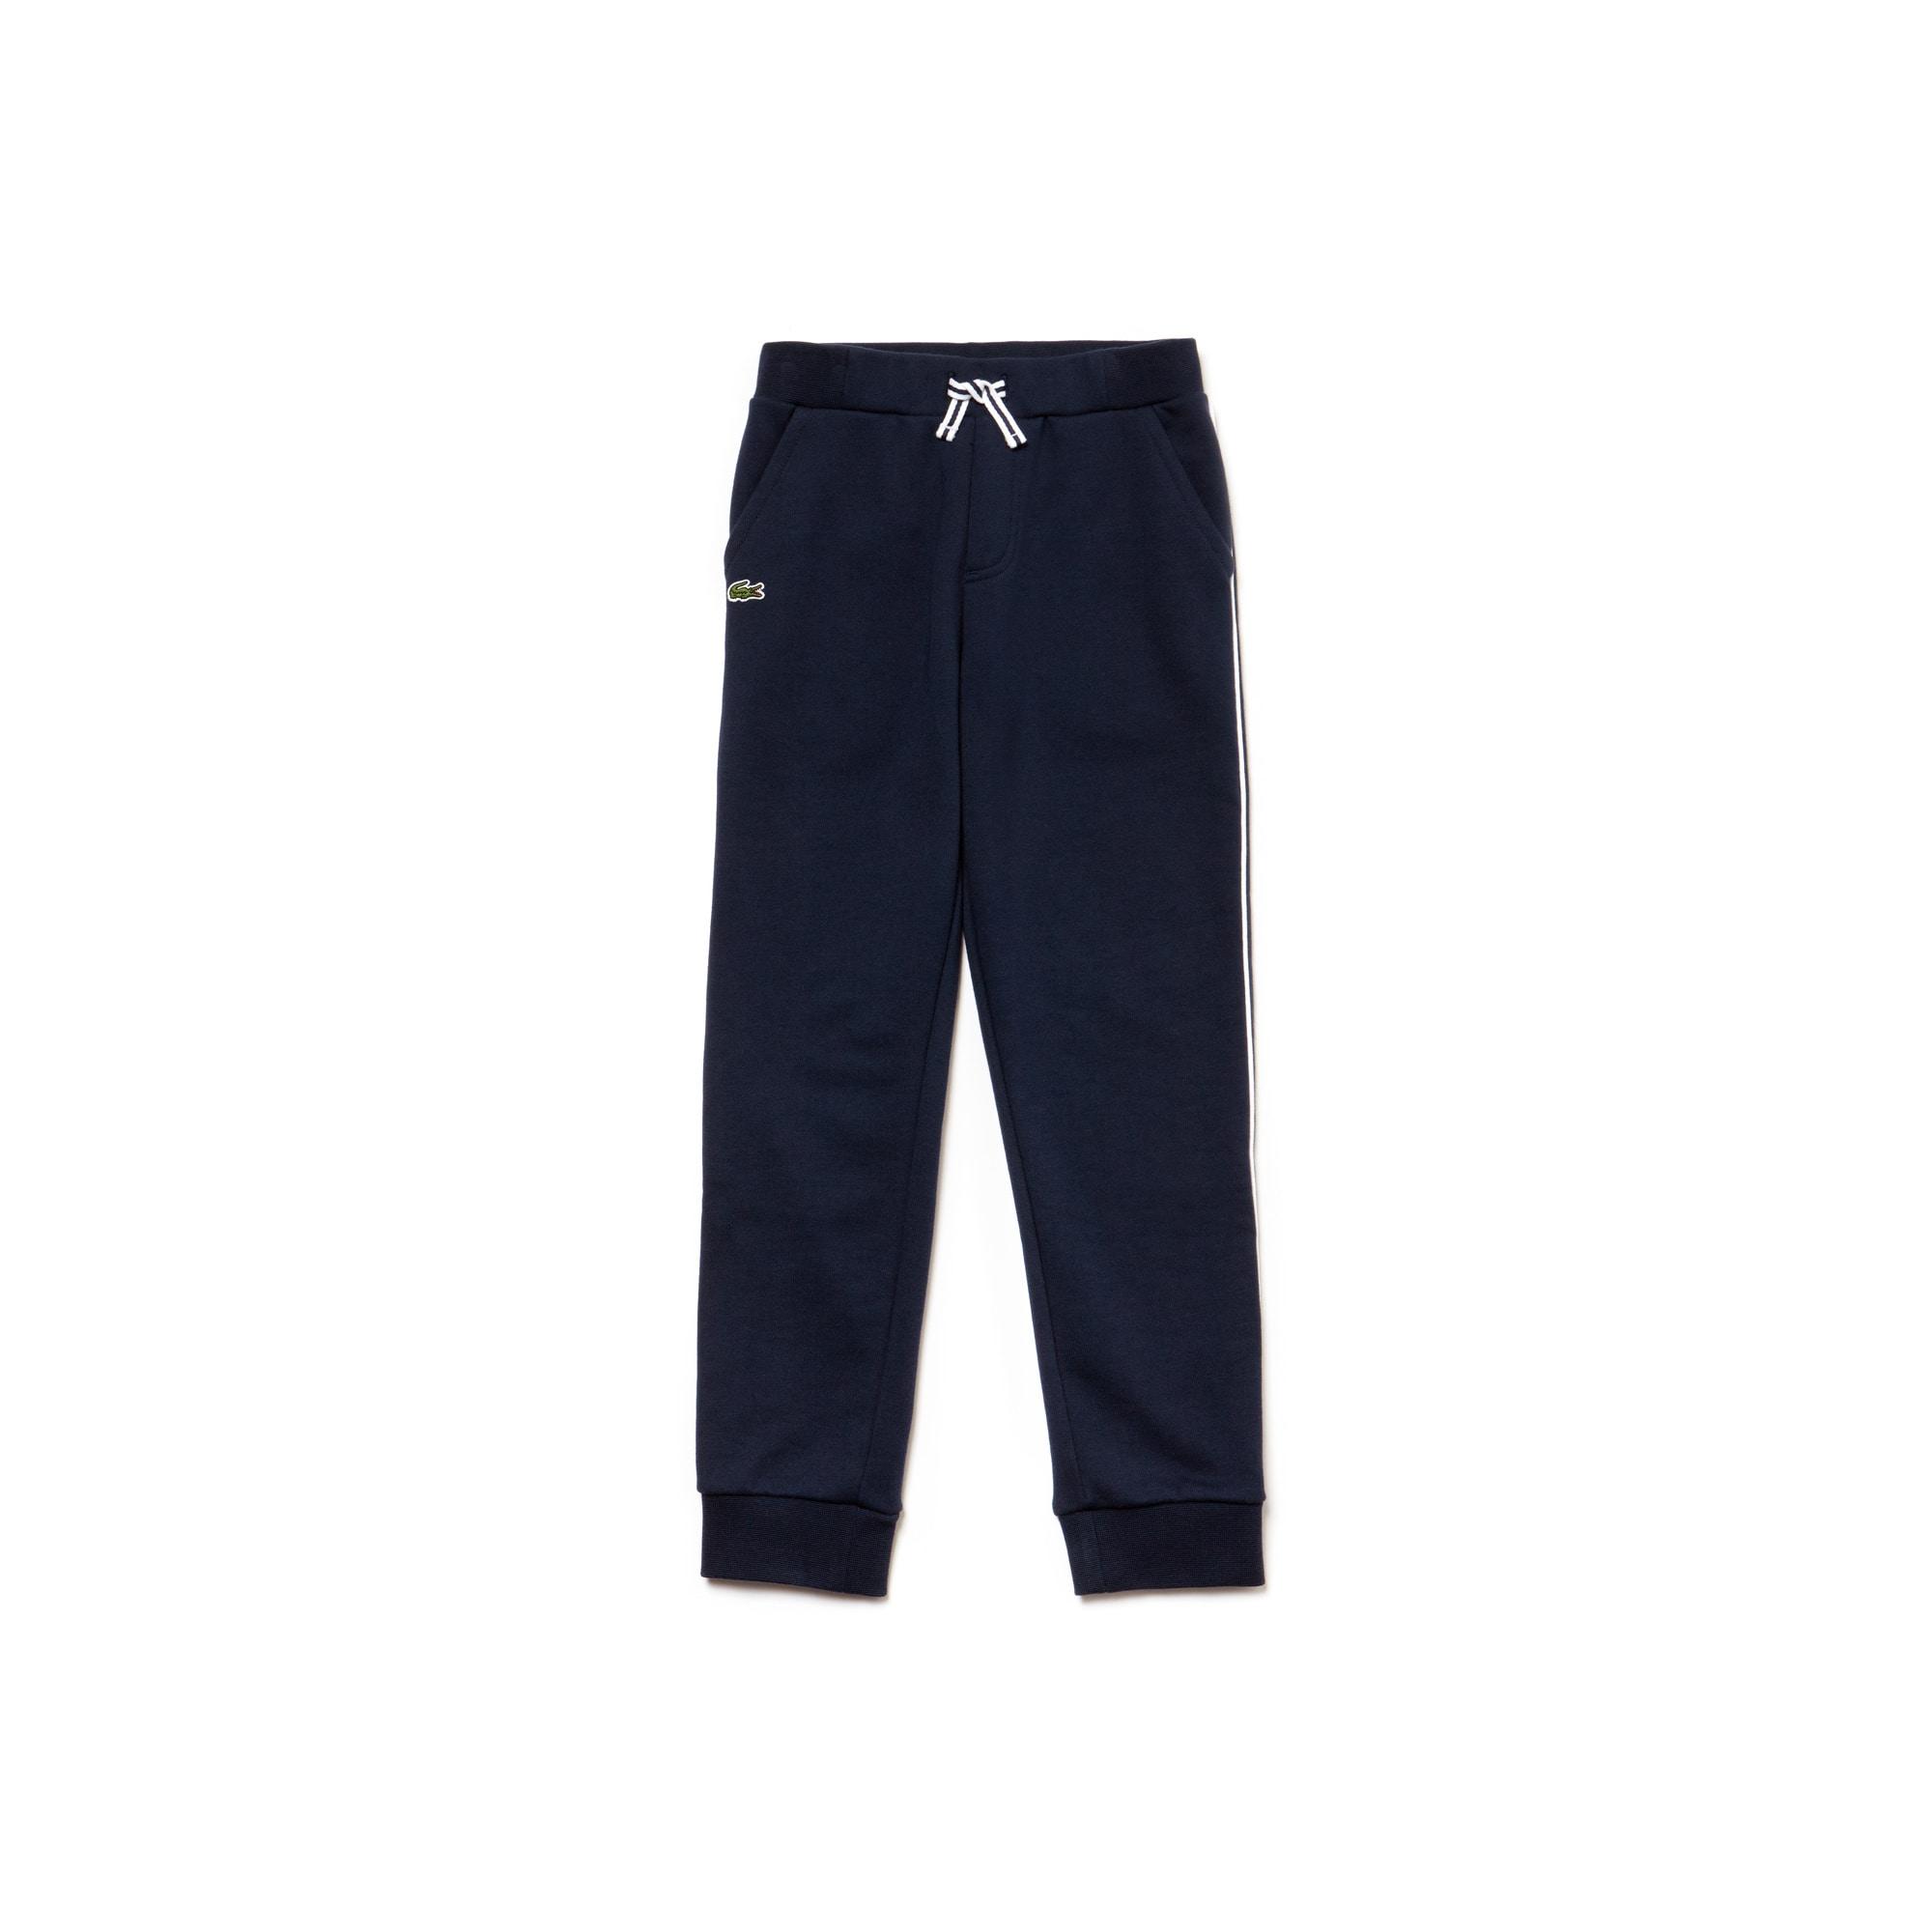 Boys' Contrast Bands Fleece Jogging Pants